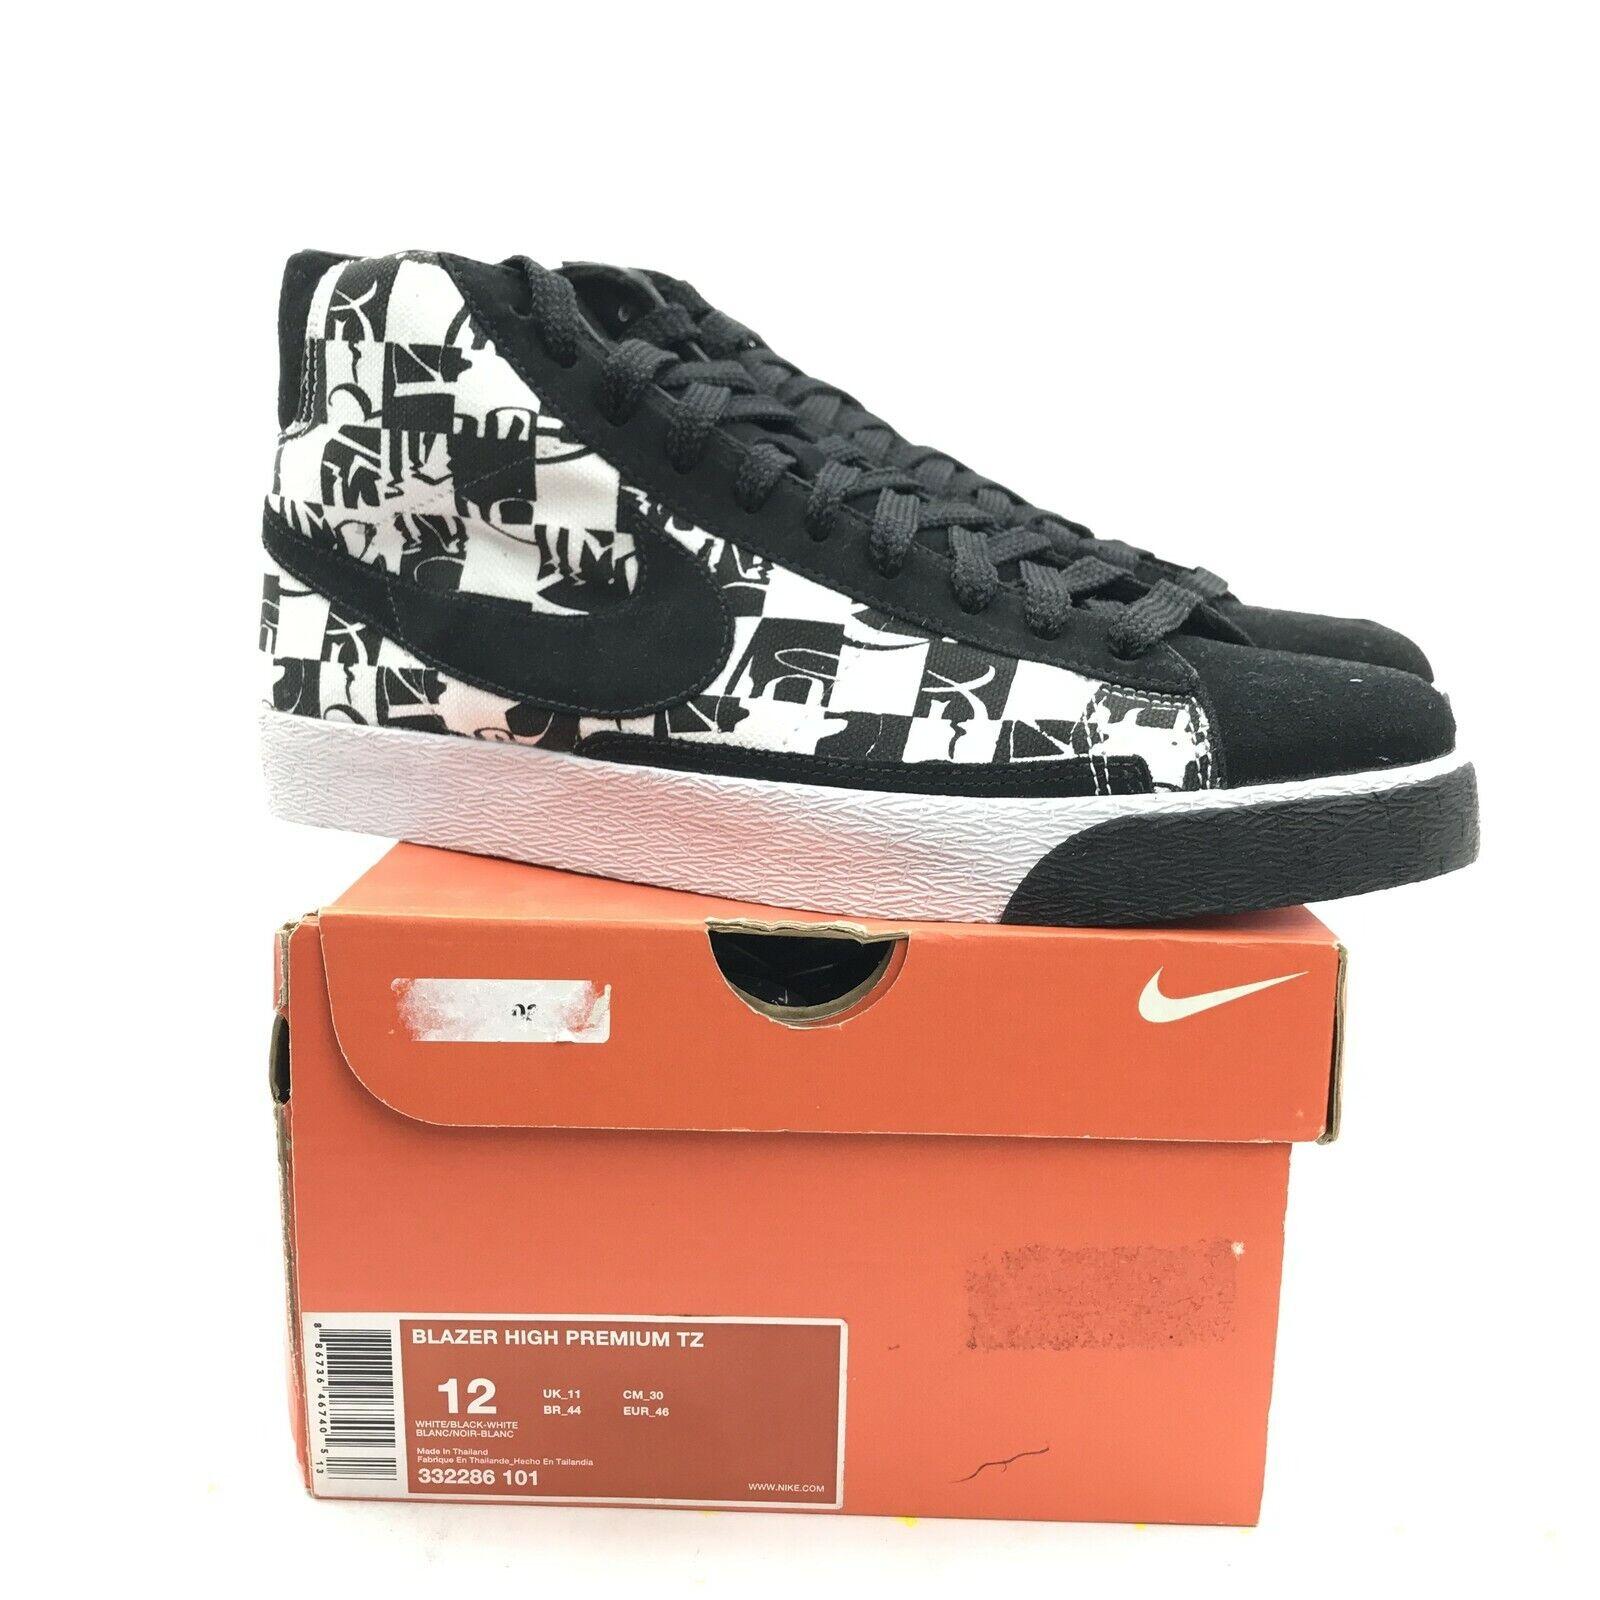 Nike Blazer High Premium TZ Stussy x Neighborhood Black LIMITED 332286-101 US 12